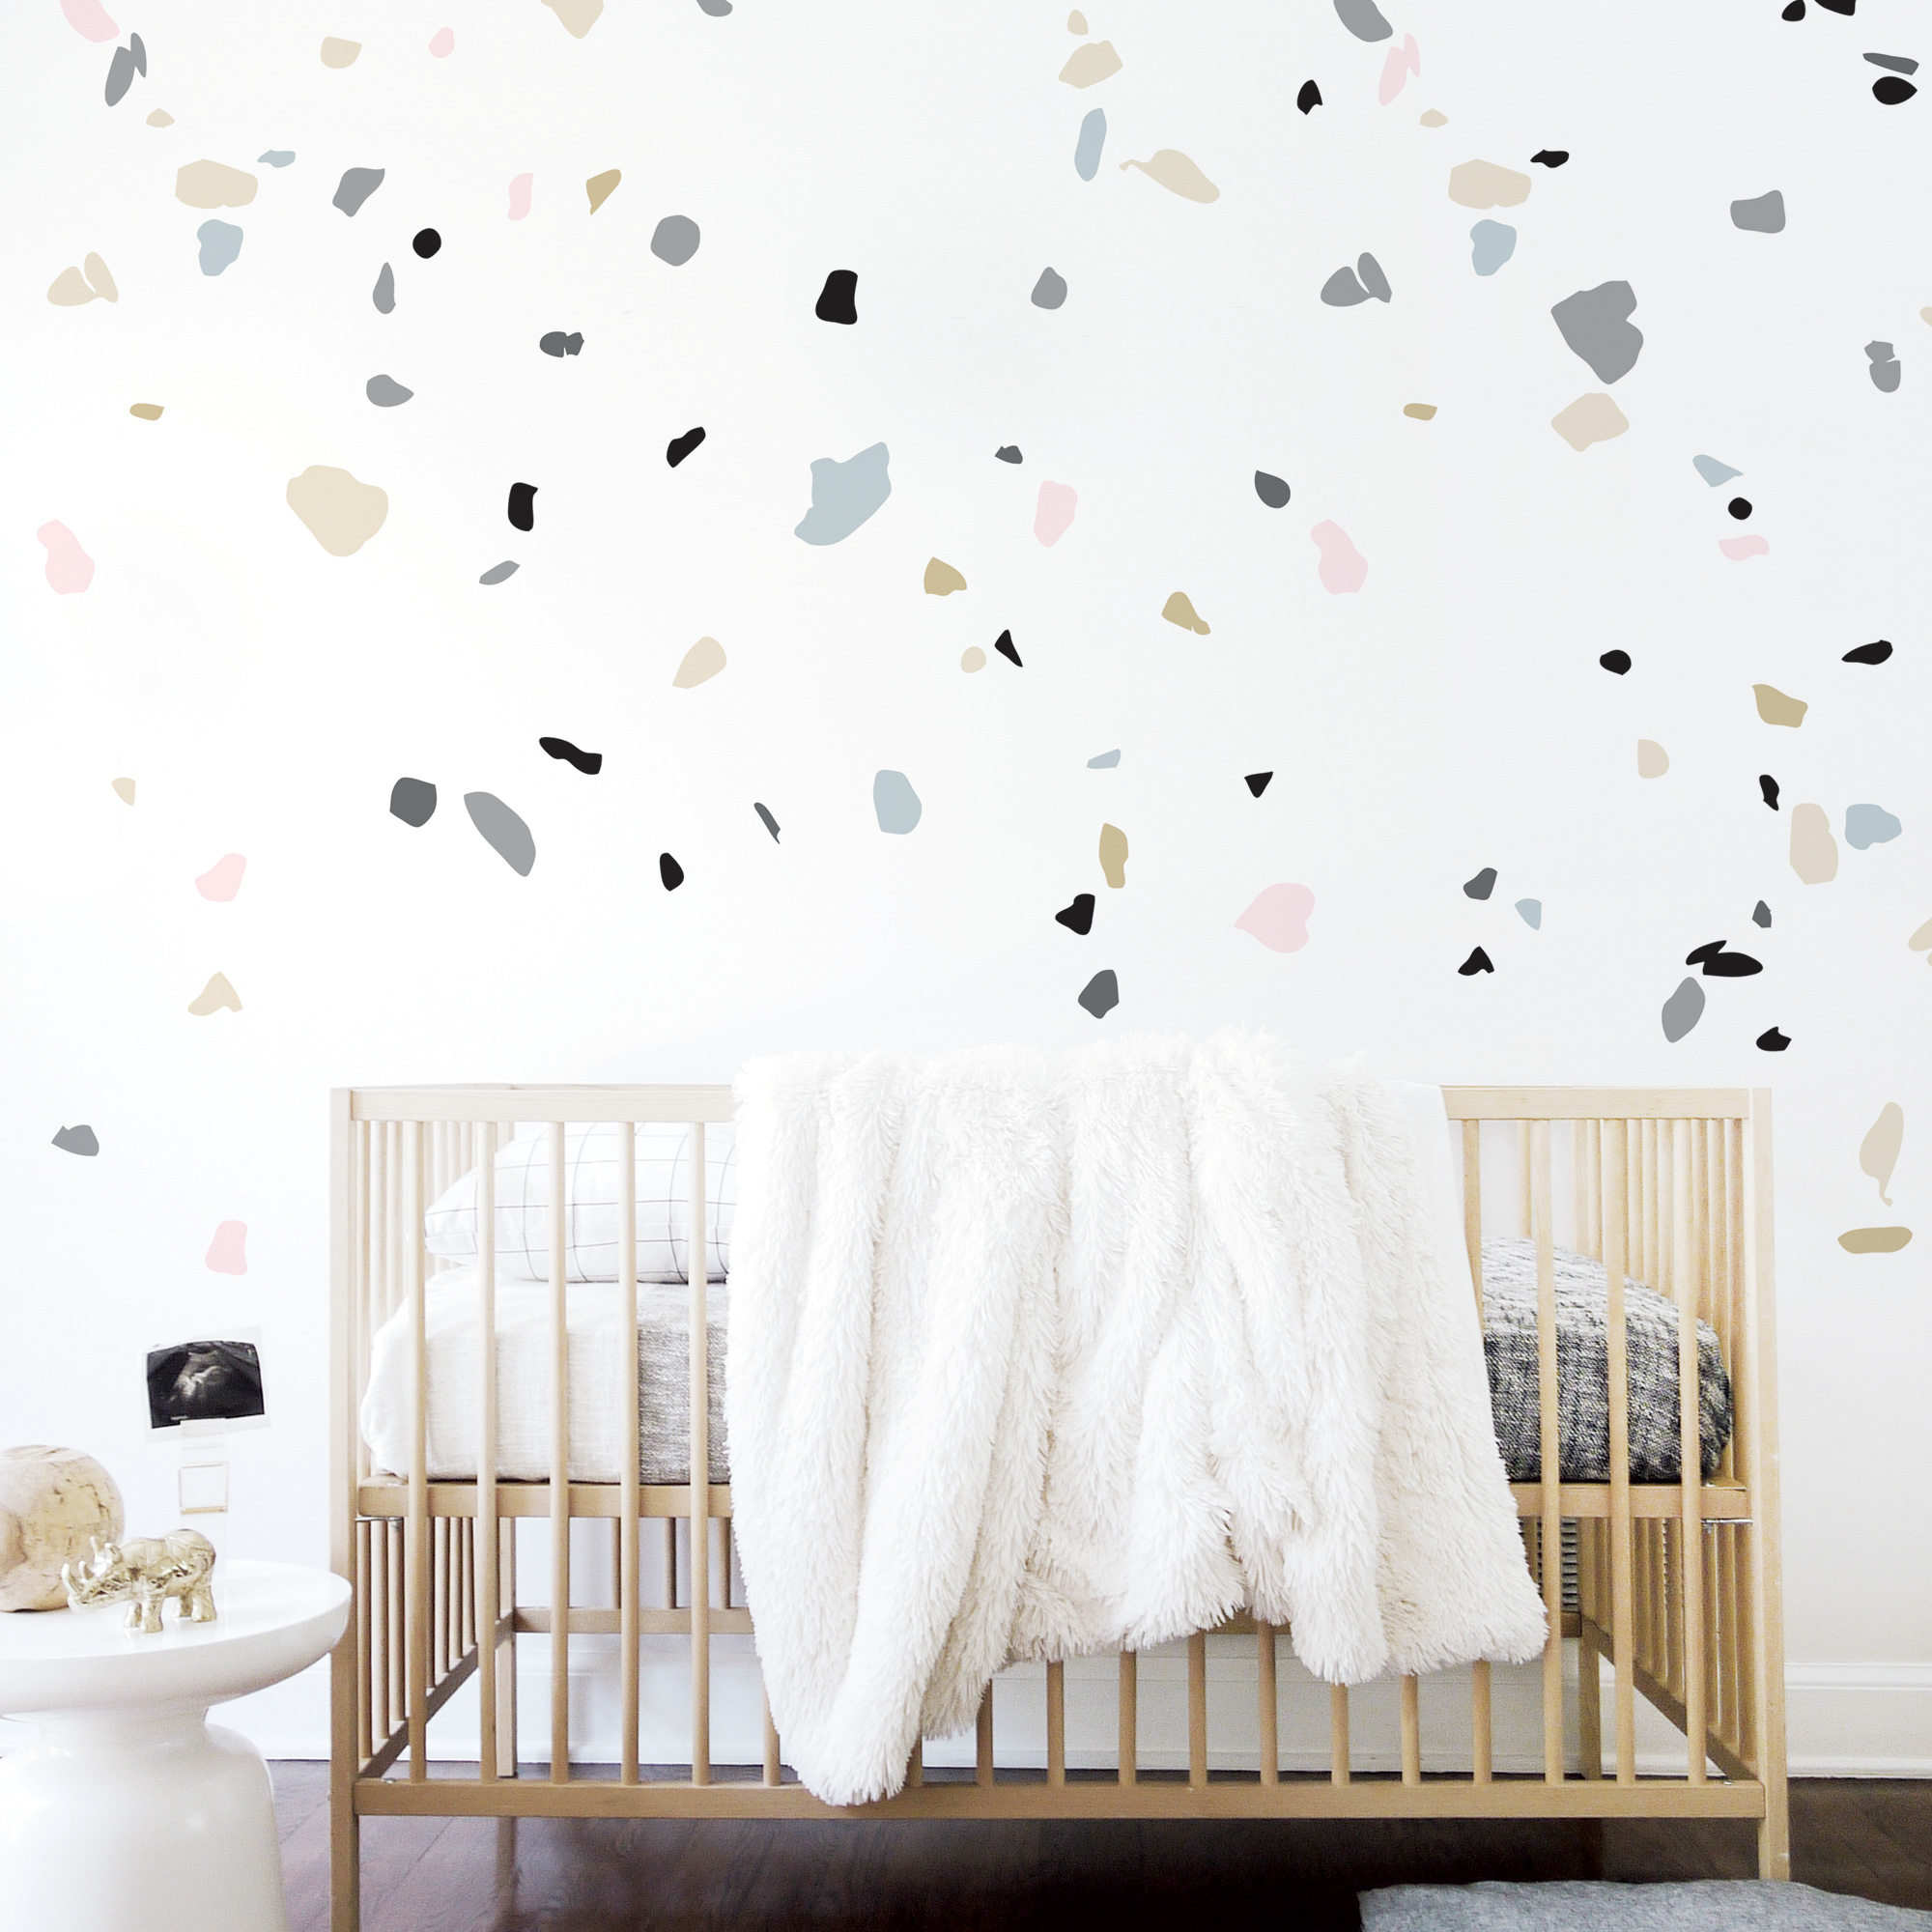 Terrazzo-wall-decals-in-a-modern-nursery-74244